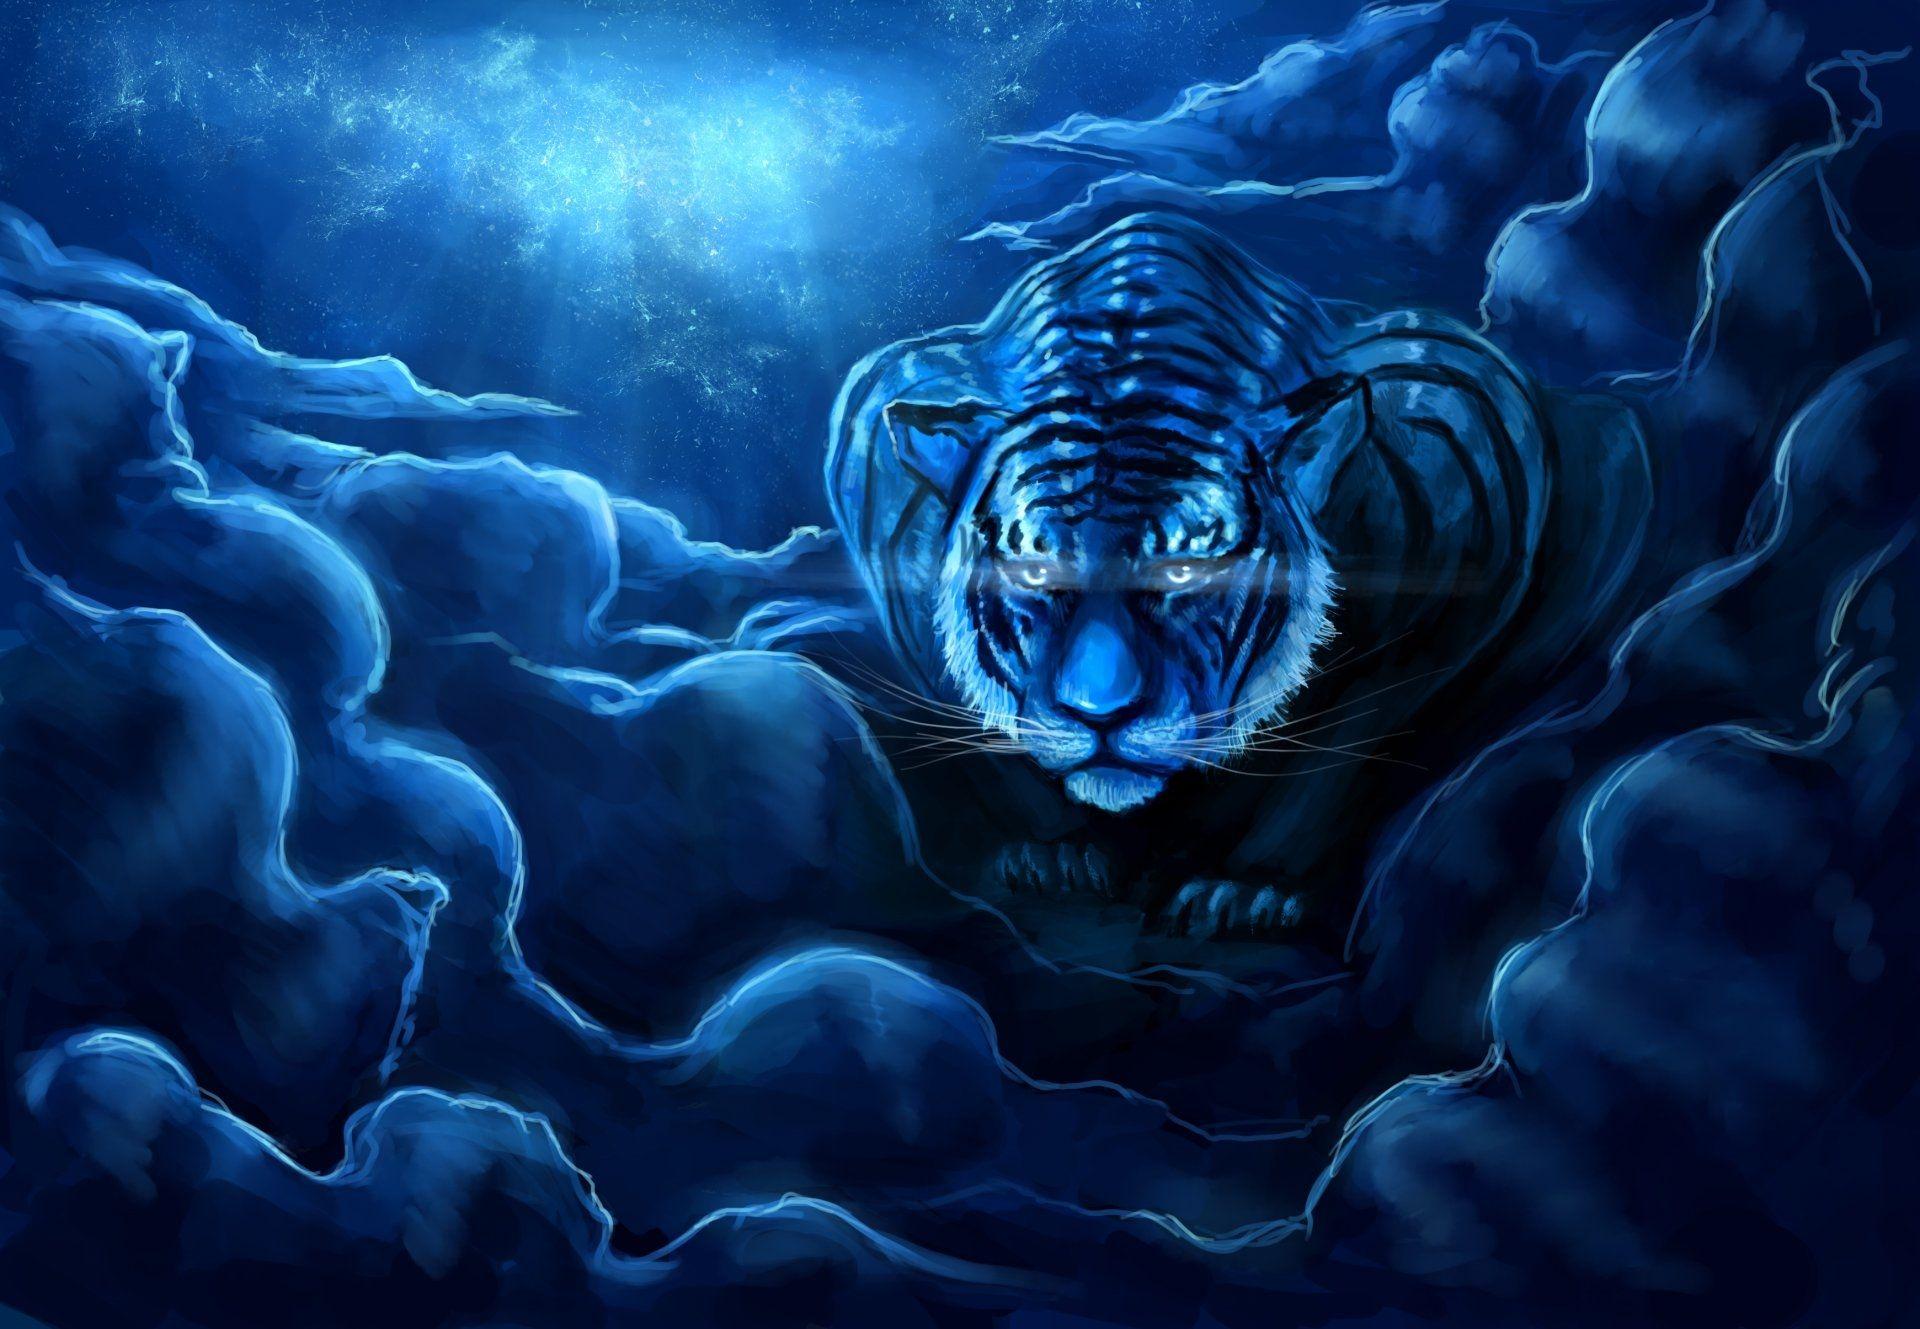 Tiger Art, Cool HD Wallpaper